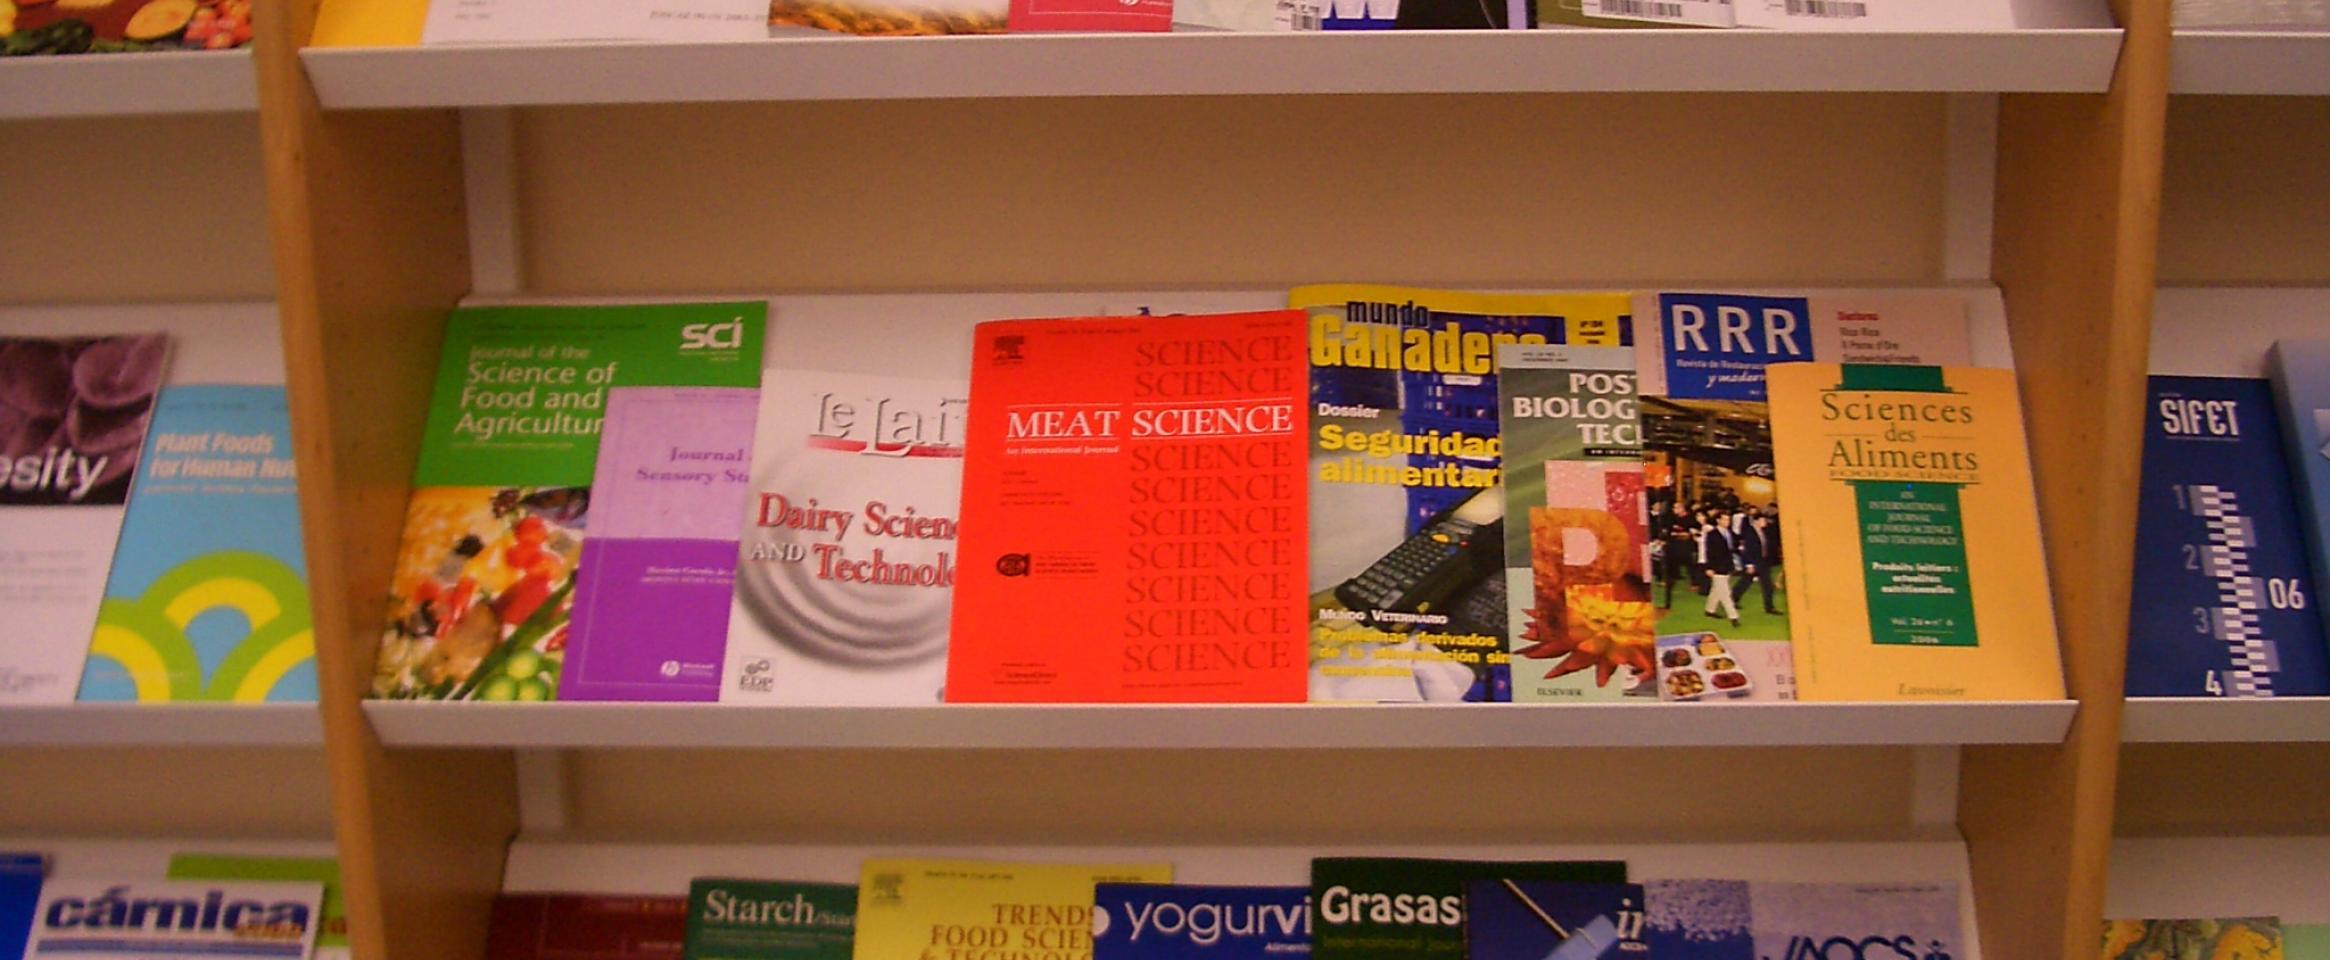 Science journals on bookshelf